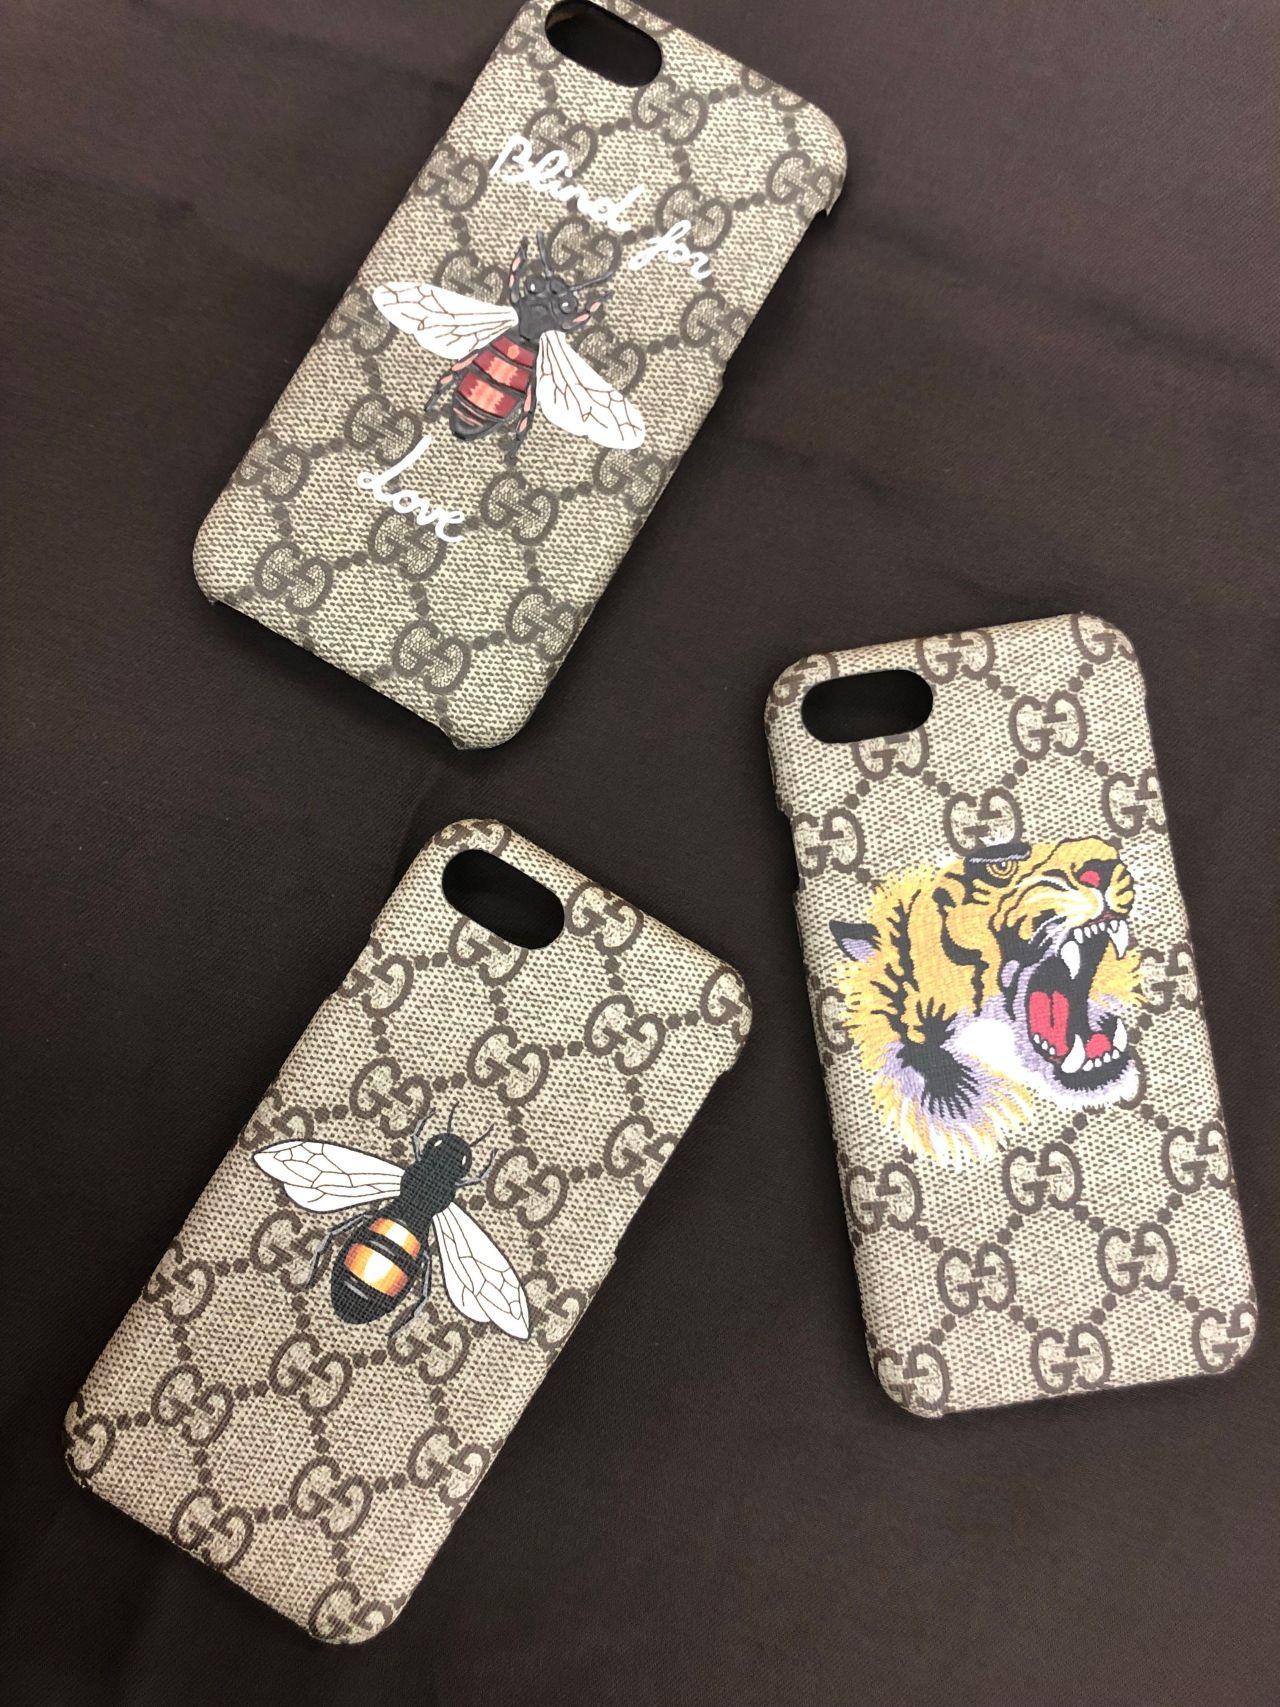 sale retailer 3d502 50992 GUCCI☆iPhoneケース | 安城店 | フィットハウス公式ショップ ...